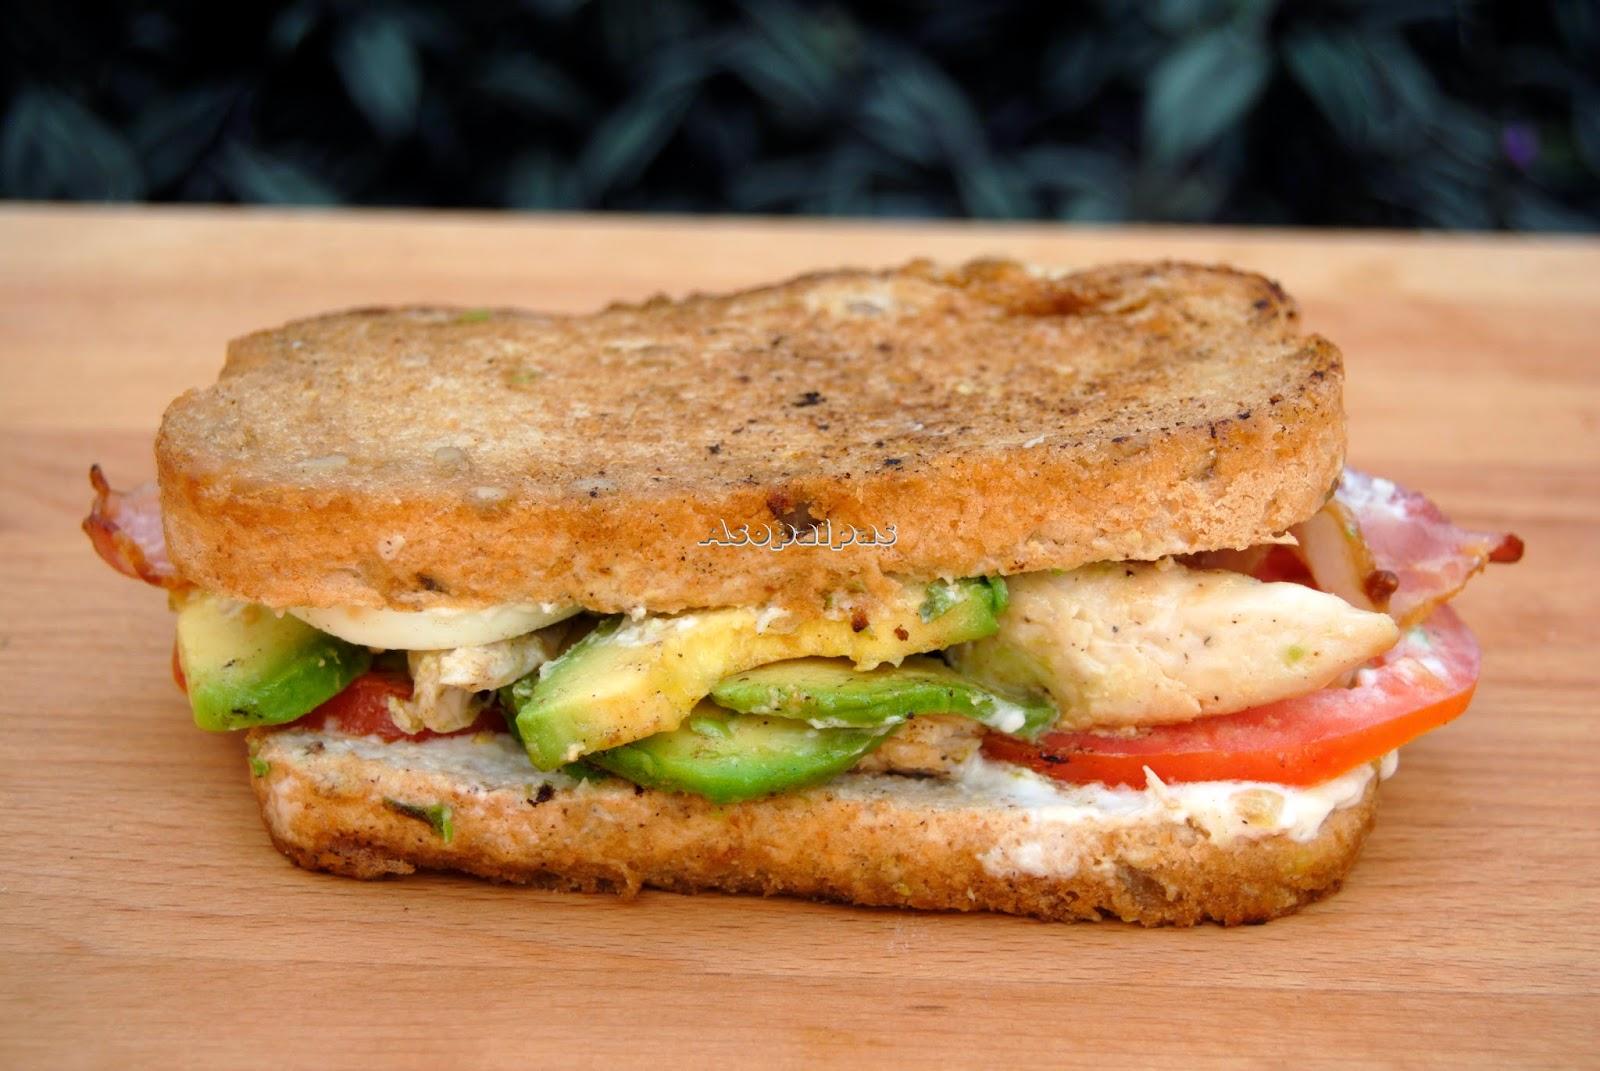 Sándwich Ensalada Cobb (Cobb Salad Sandwich)